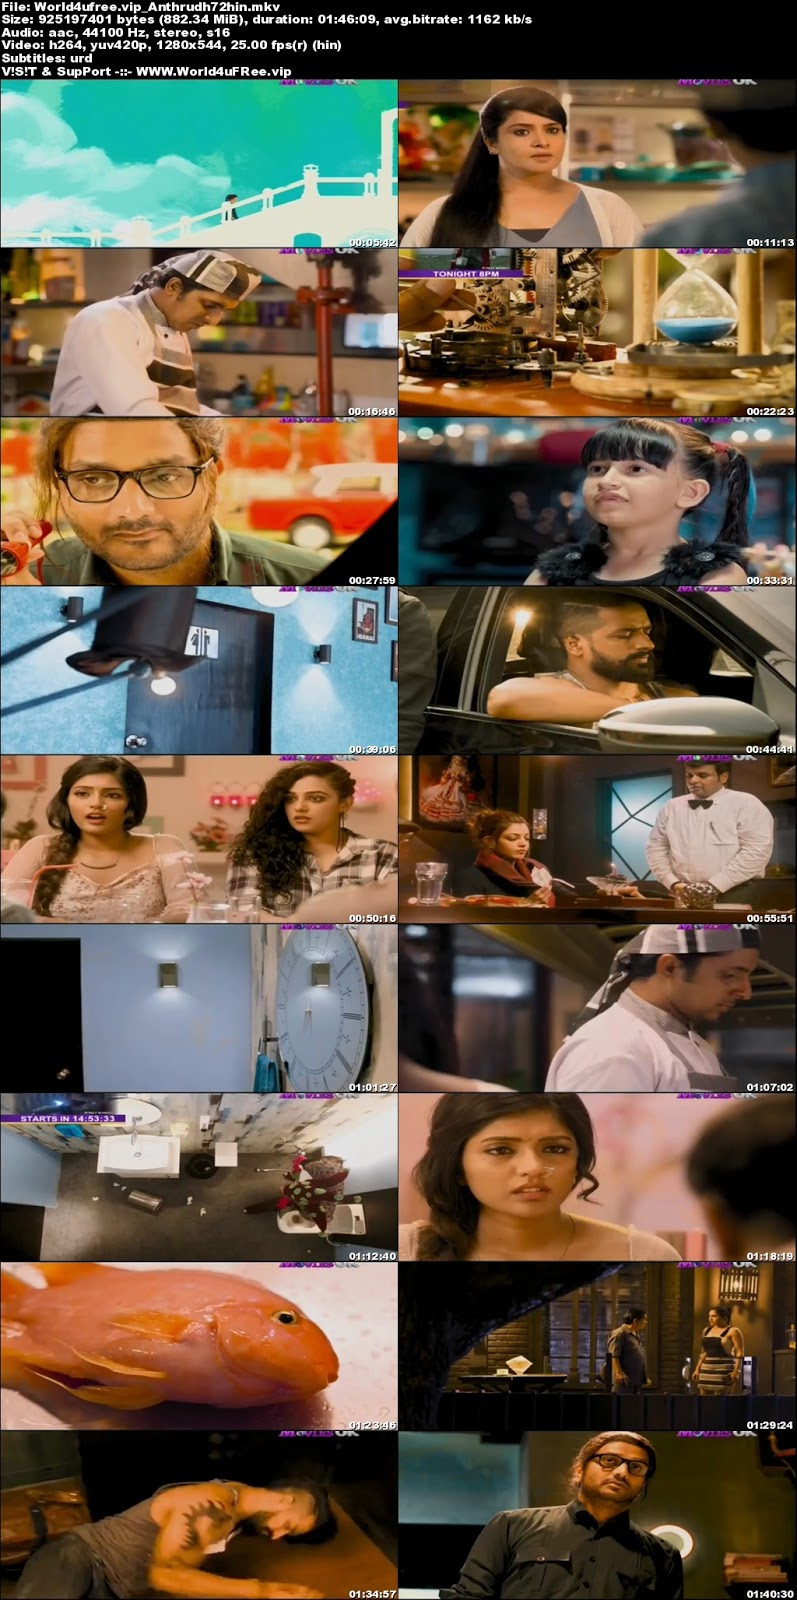 Antharyudh (Awe) 2018 Hindi Dubbed 720p HDTV 900Mb x264 world4ufree.vip , South indian movie Antharyudh (Awe) 2018 hindi dubbed world4ufree.vip 720p hdrip webrip dvdrip 700mb brrip bluray free download or watch online at world4ufree.vip